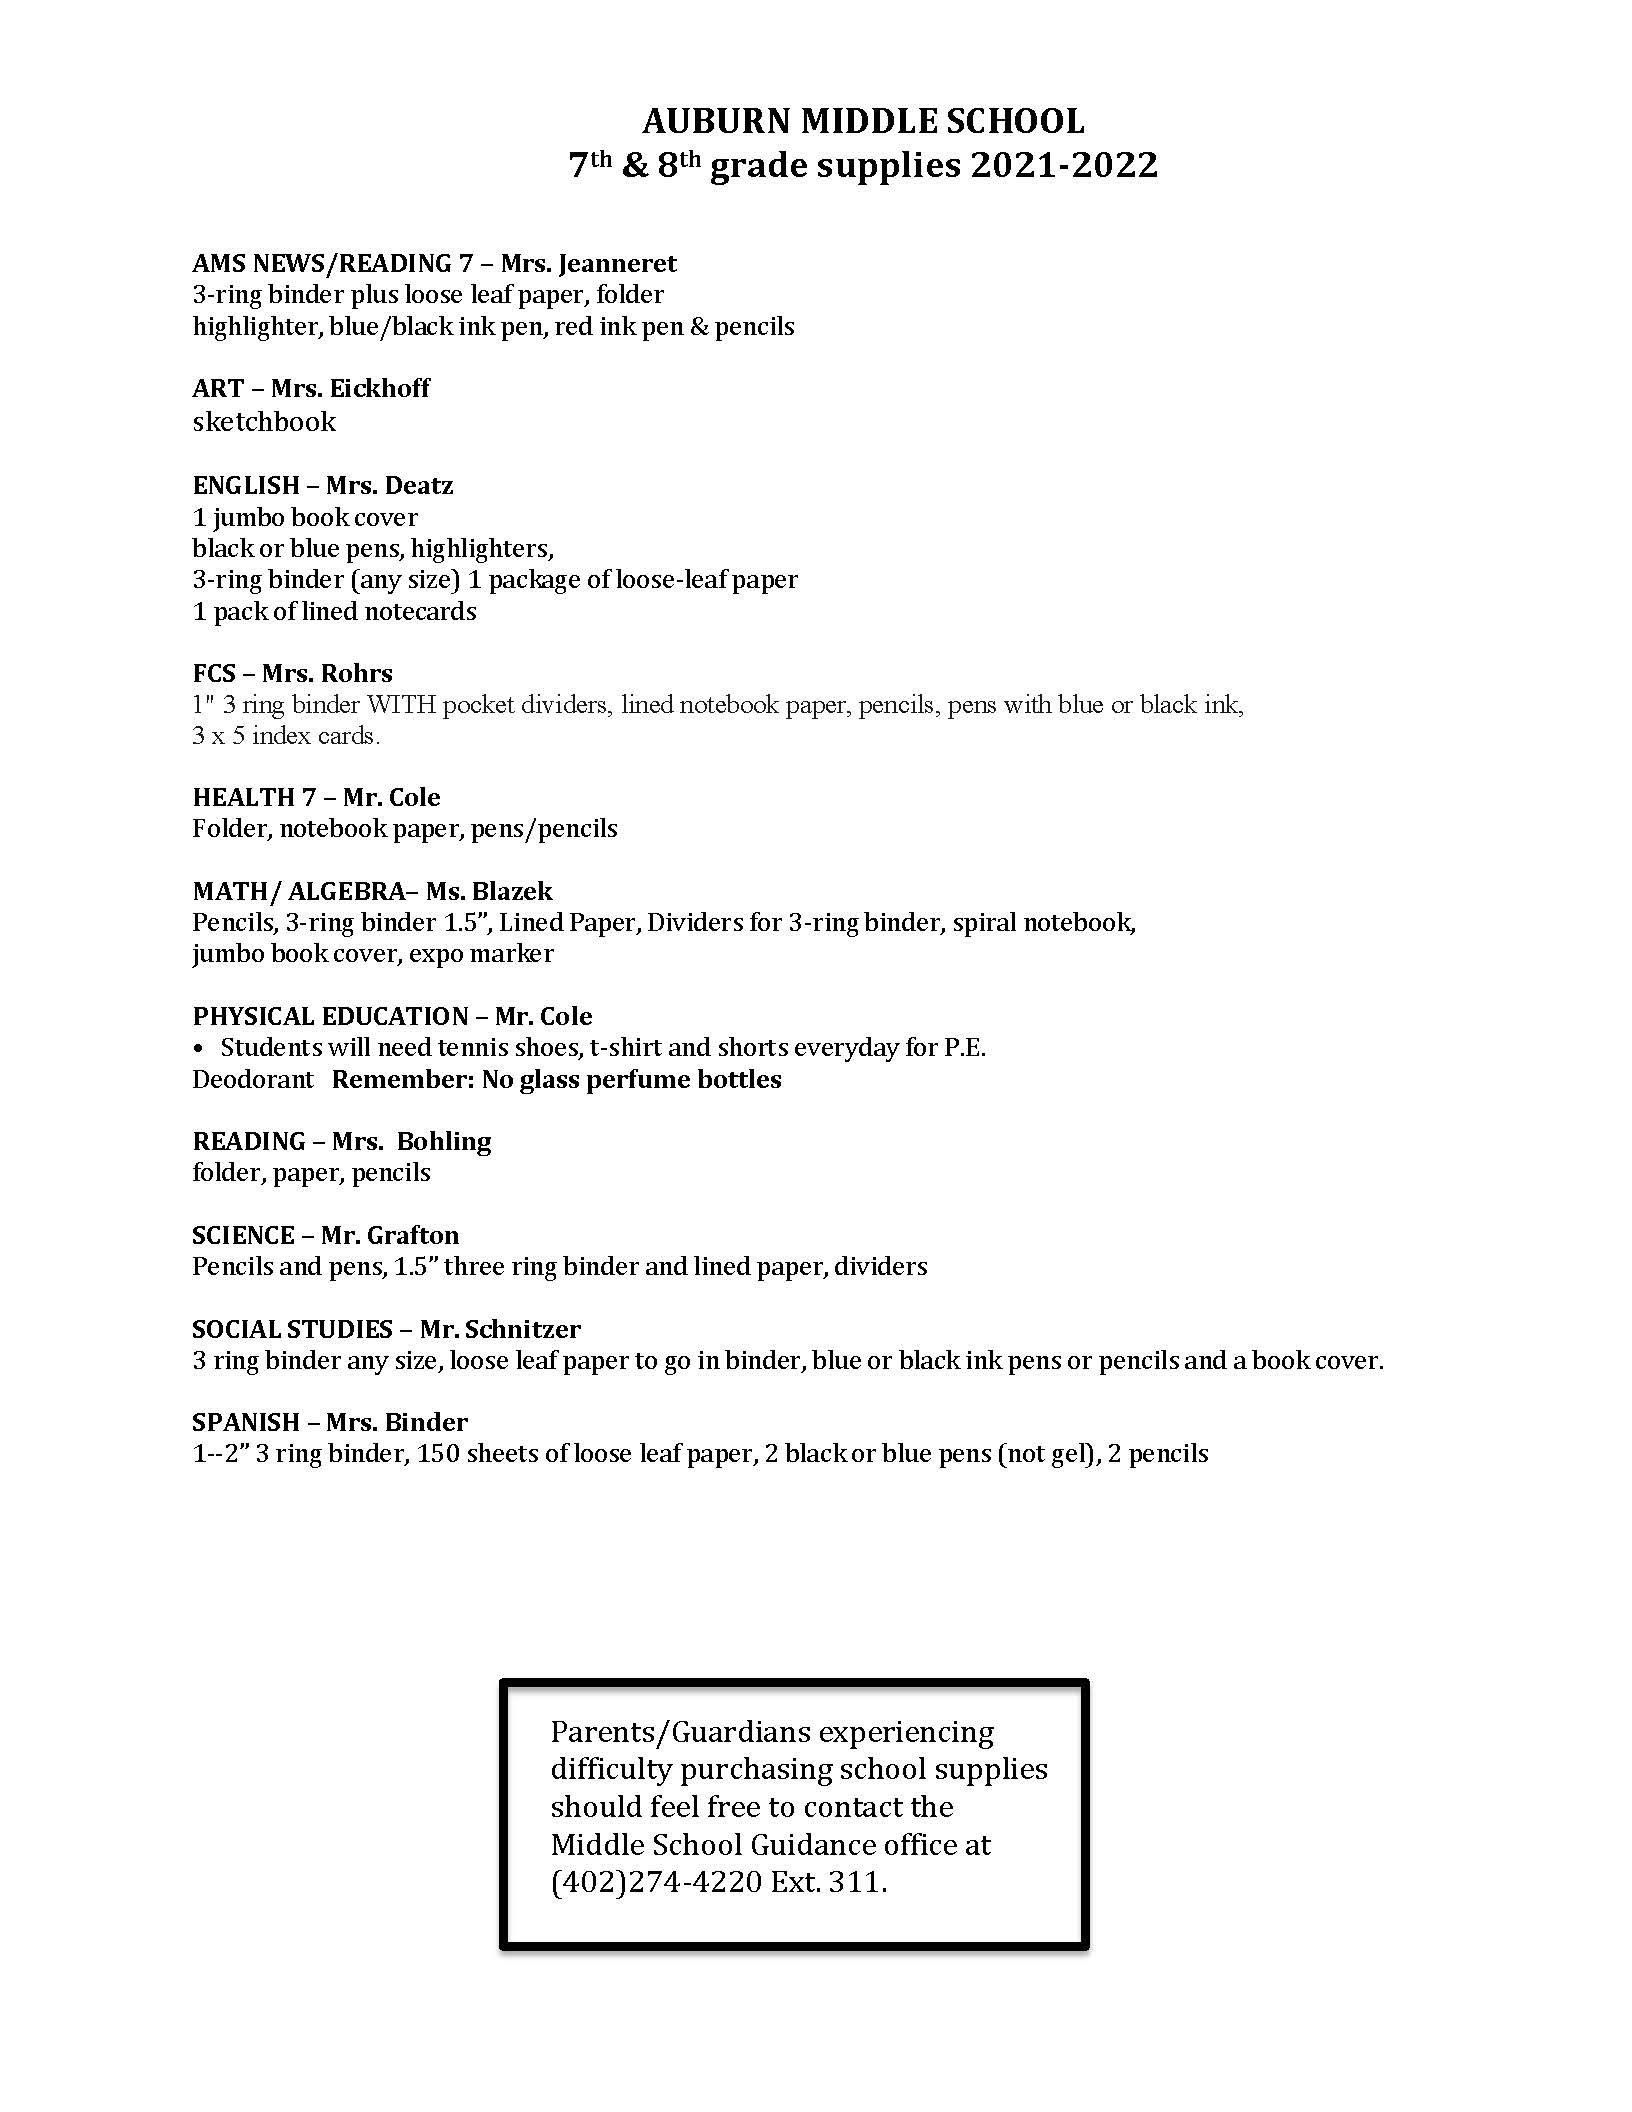 Auburn Middle School 6th Grade Supply List 2021-2022